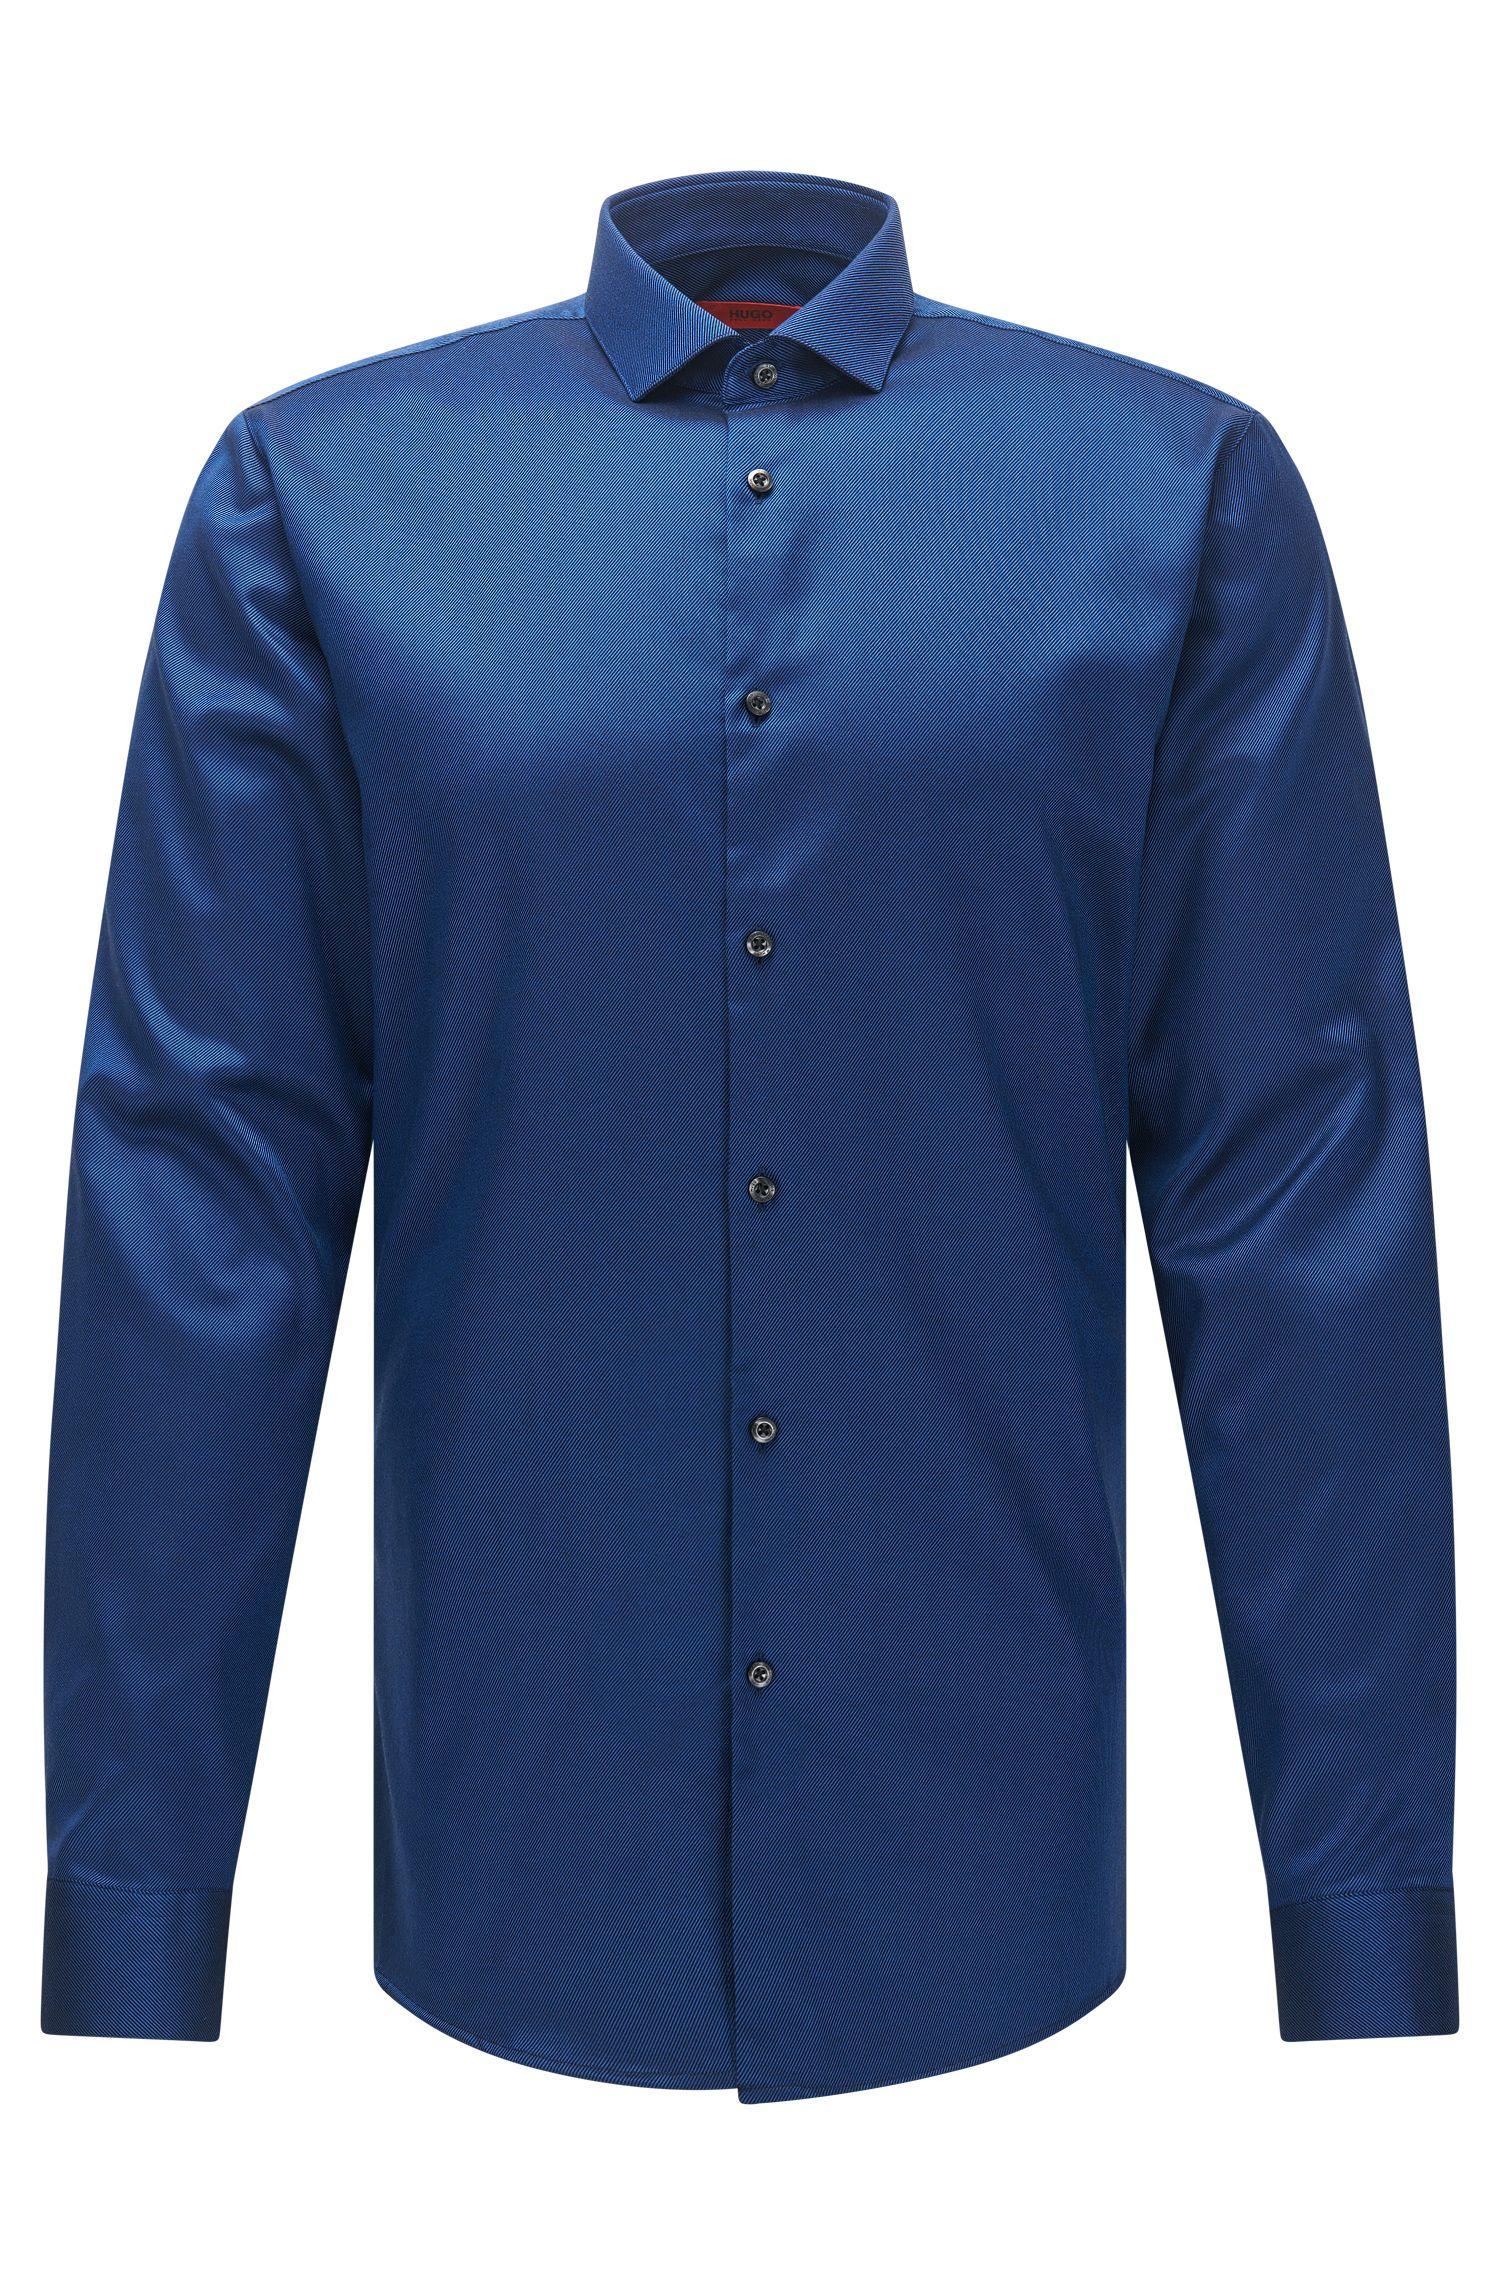 Easy-Iron Twill Cotton Dress Shirt, Extra-Slim Fit   Erondo